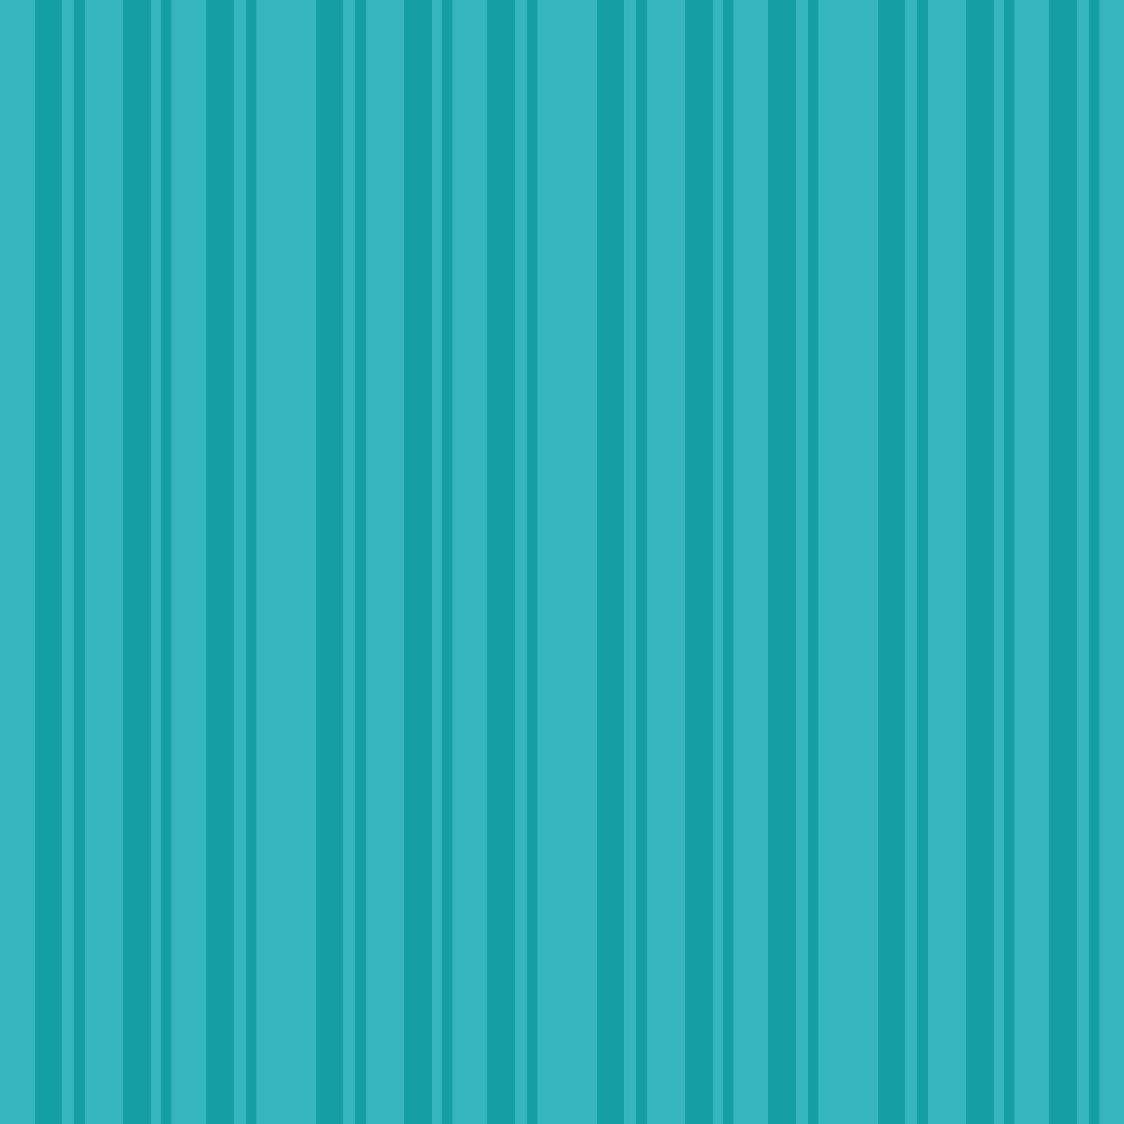 Fondos a rayas paterns - Papel de pared de rayas ...